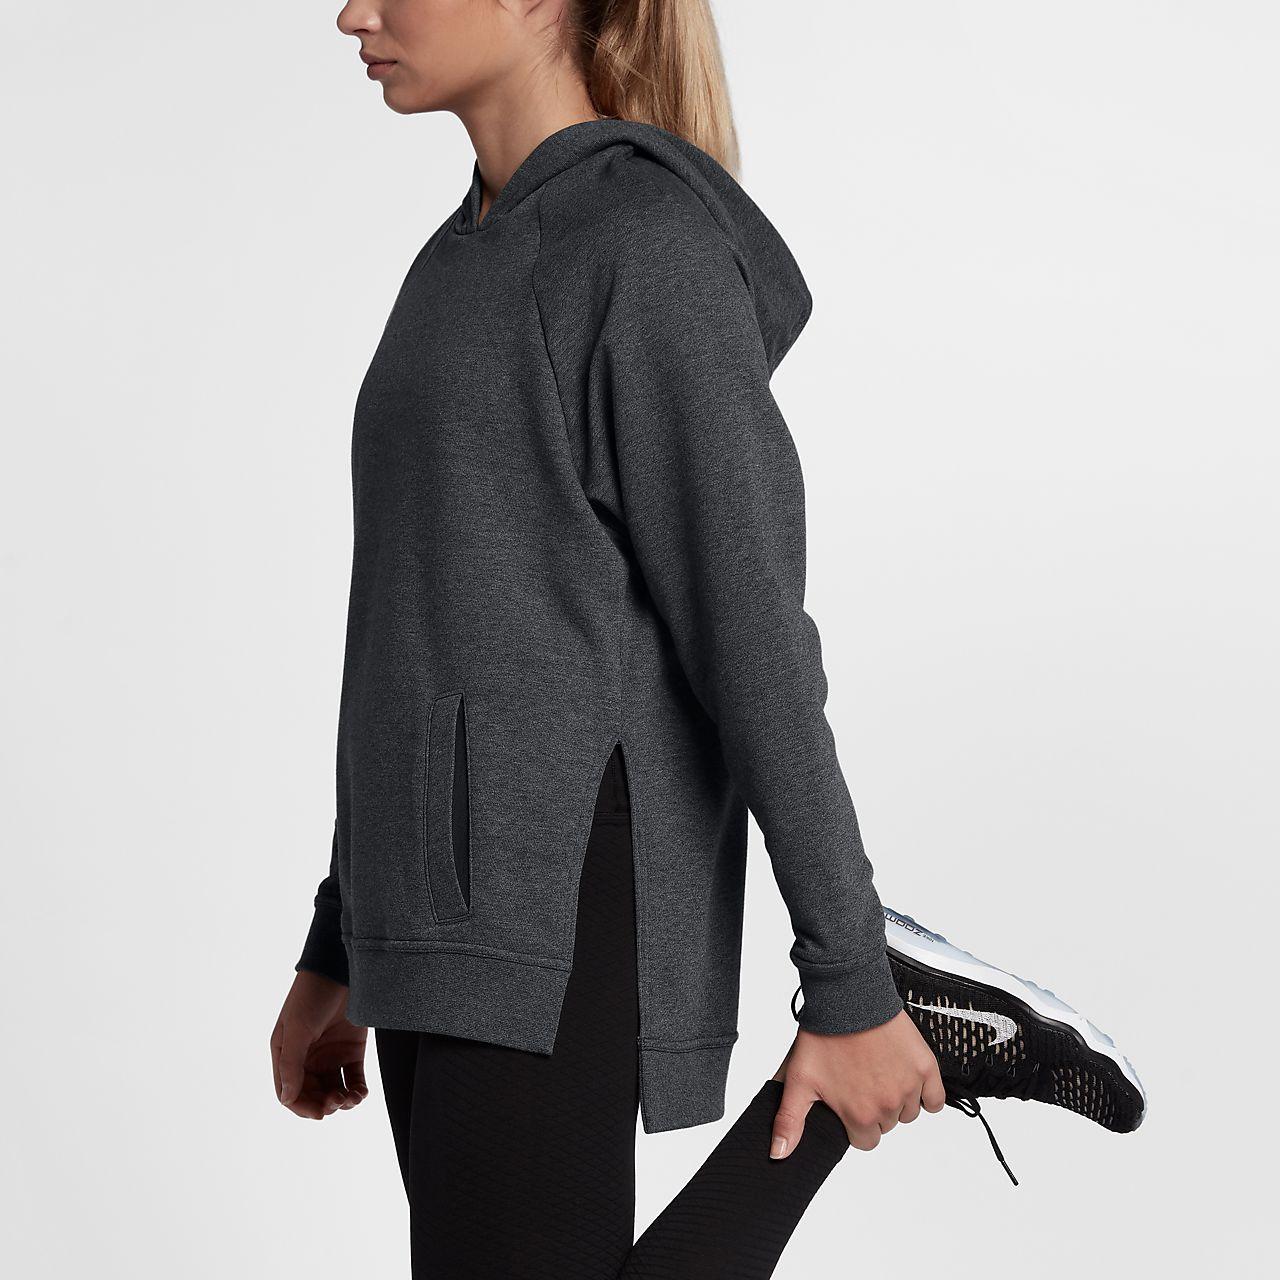 El respeto agujas del reloj En particular  Nike Dry Versa Women's Training Hoodie | Womens training, Fit women, Hoodies